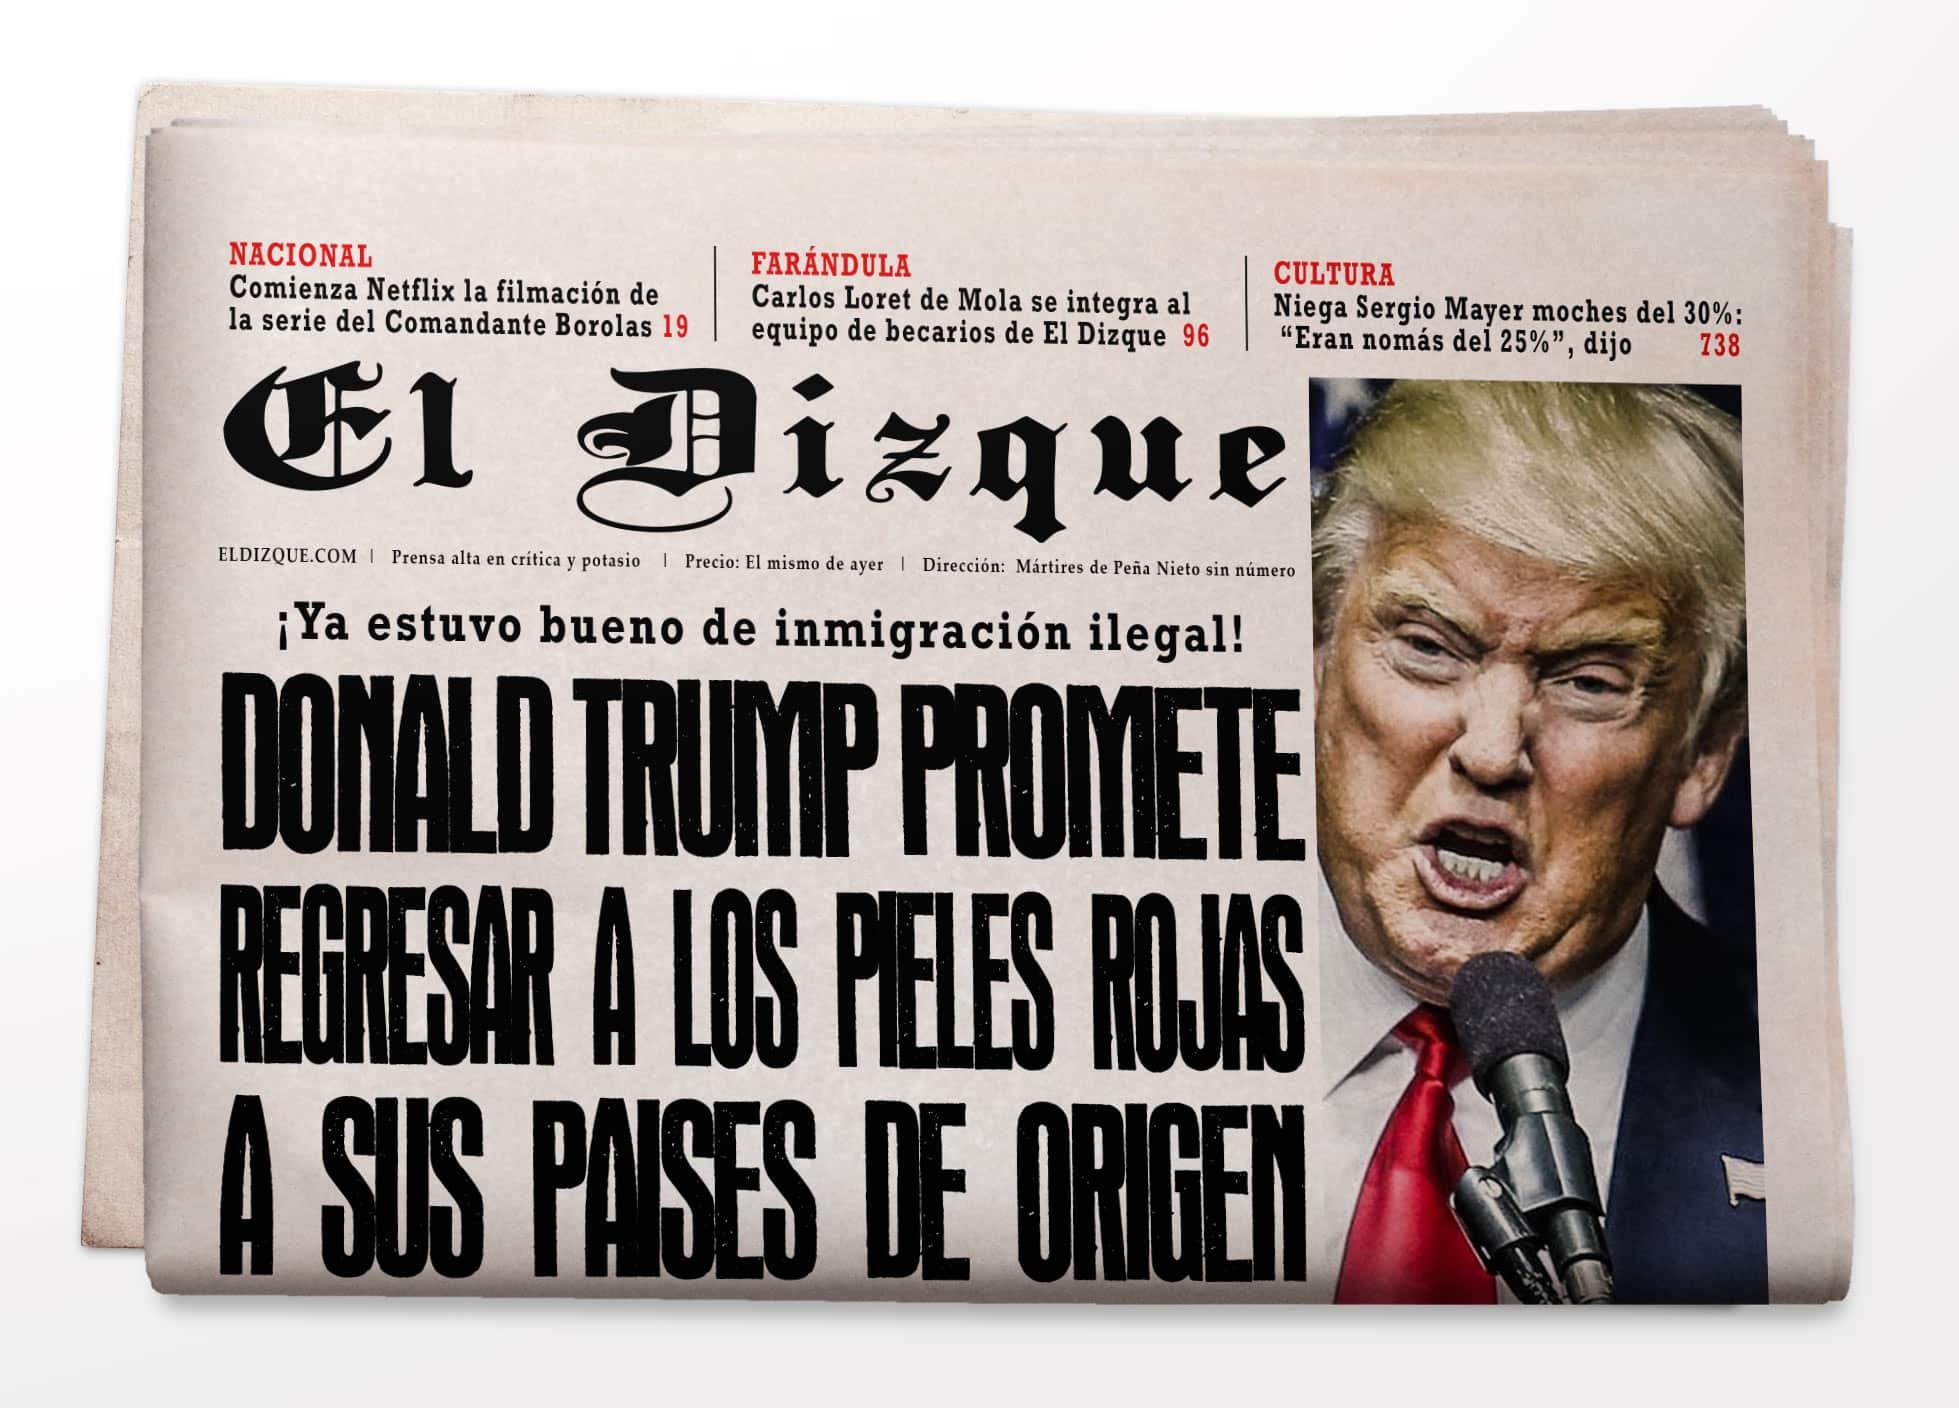 Donald Trump promete regresar a los pieles rojas a sus países de origen